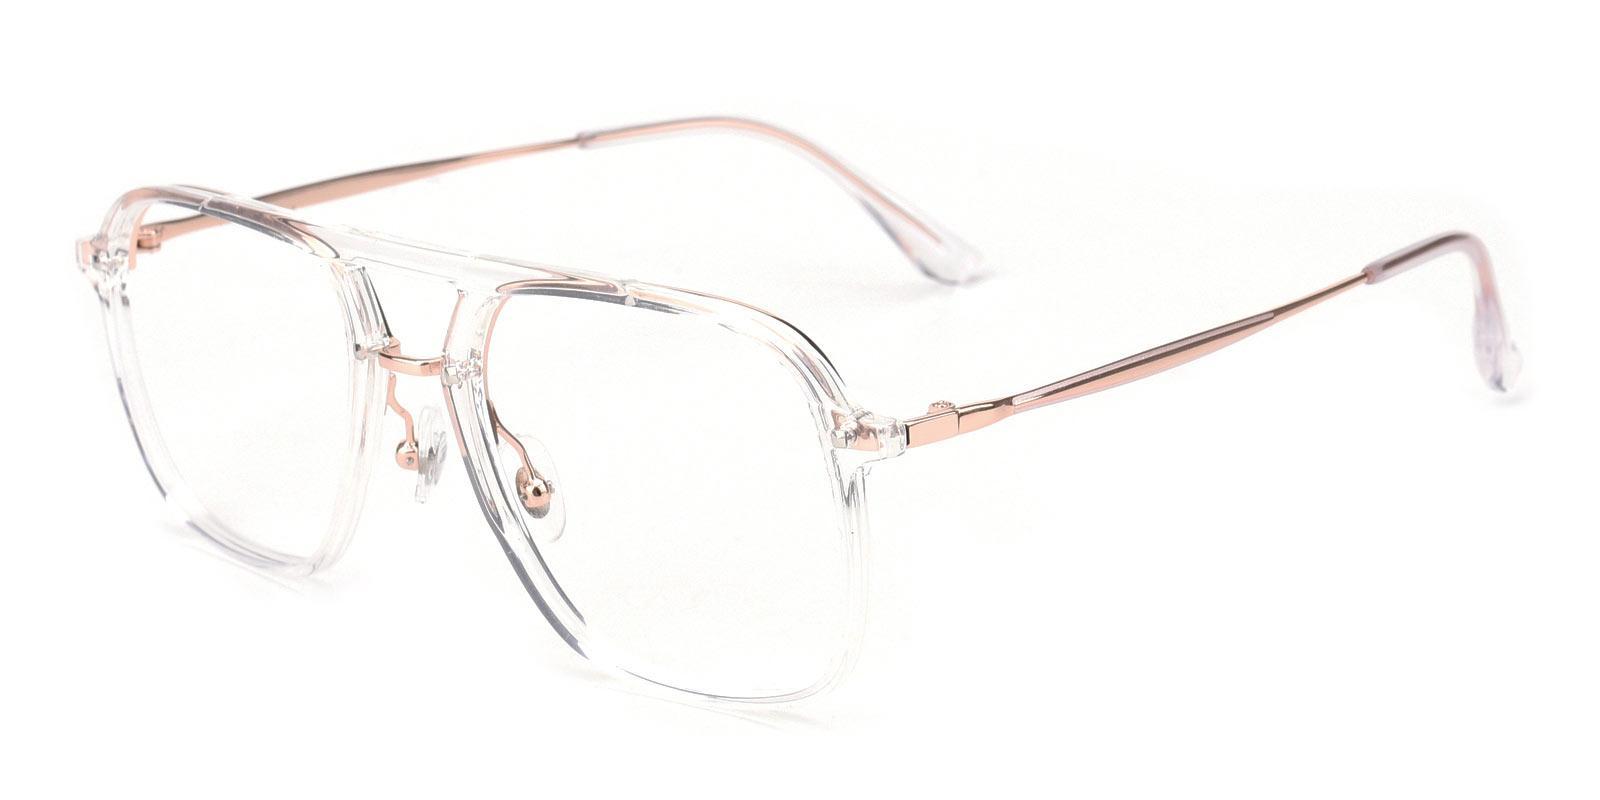 Molly-Translucent-Aviator / Square-TR-Eyeglasses-detail